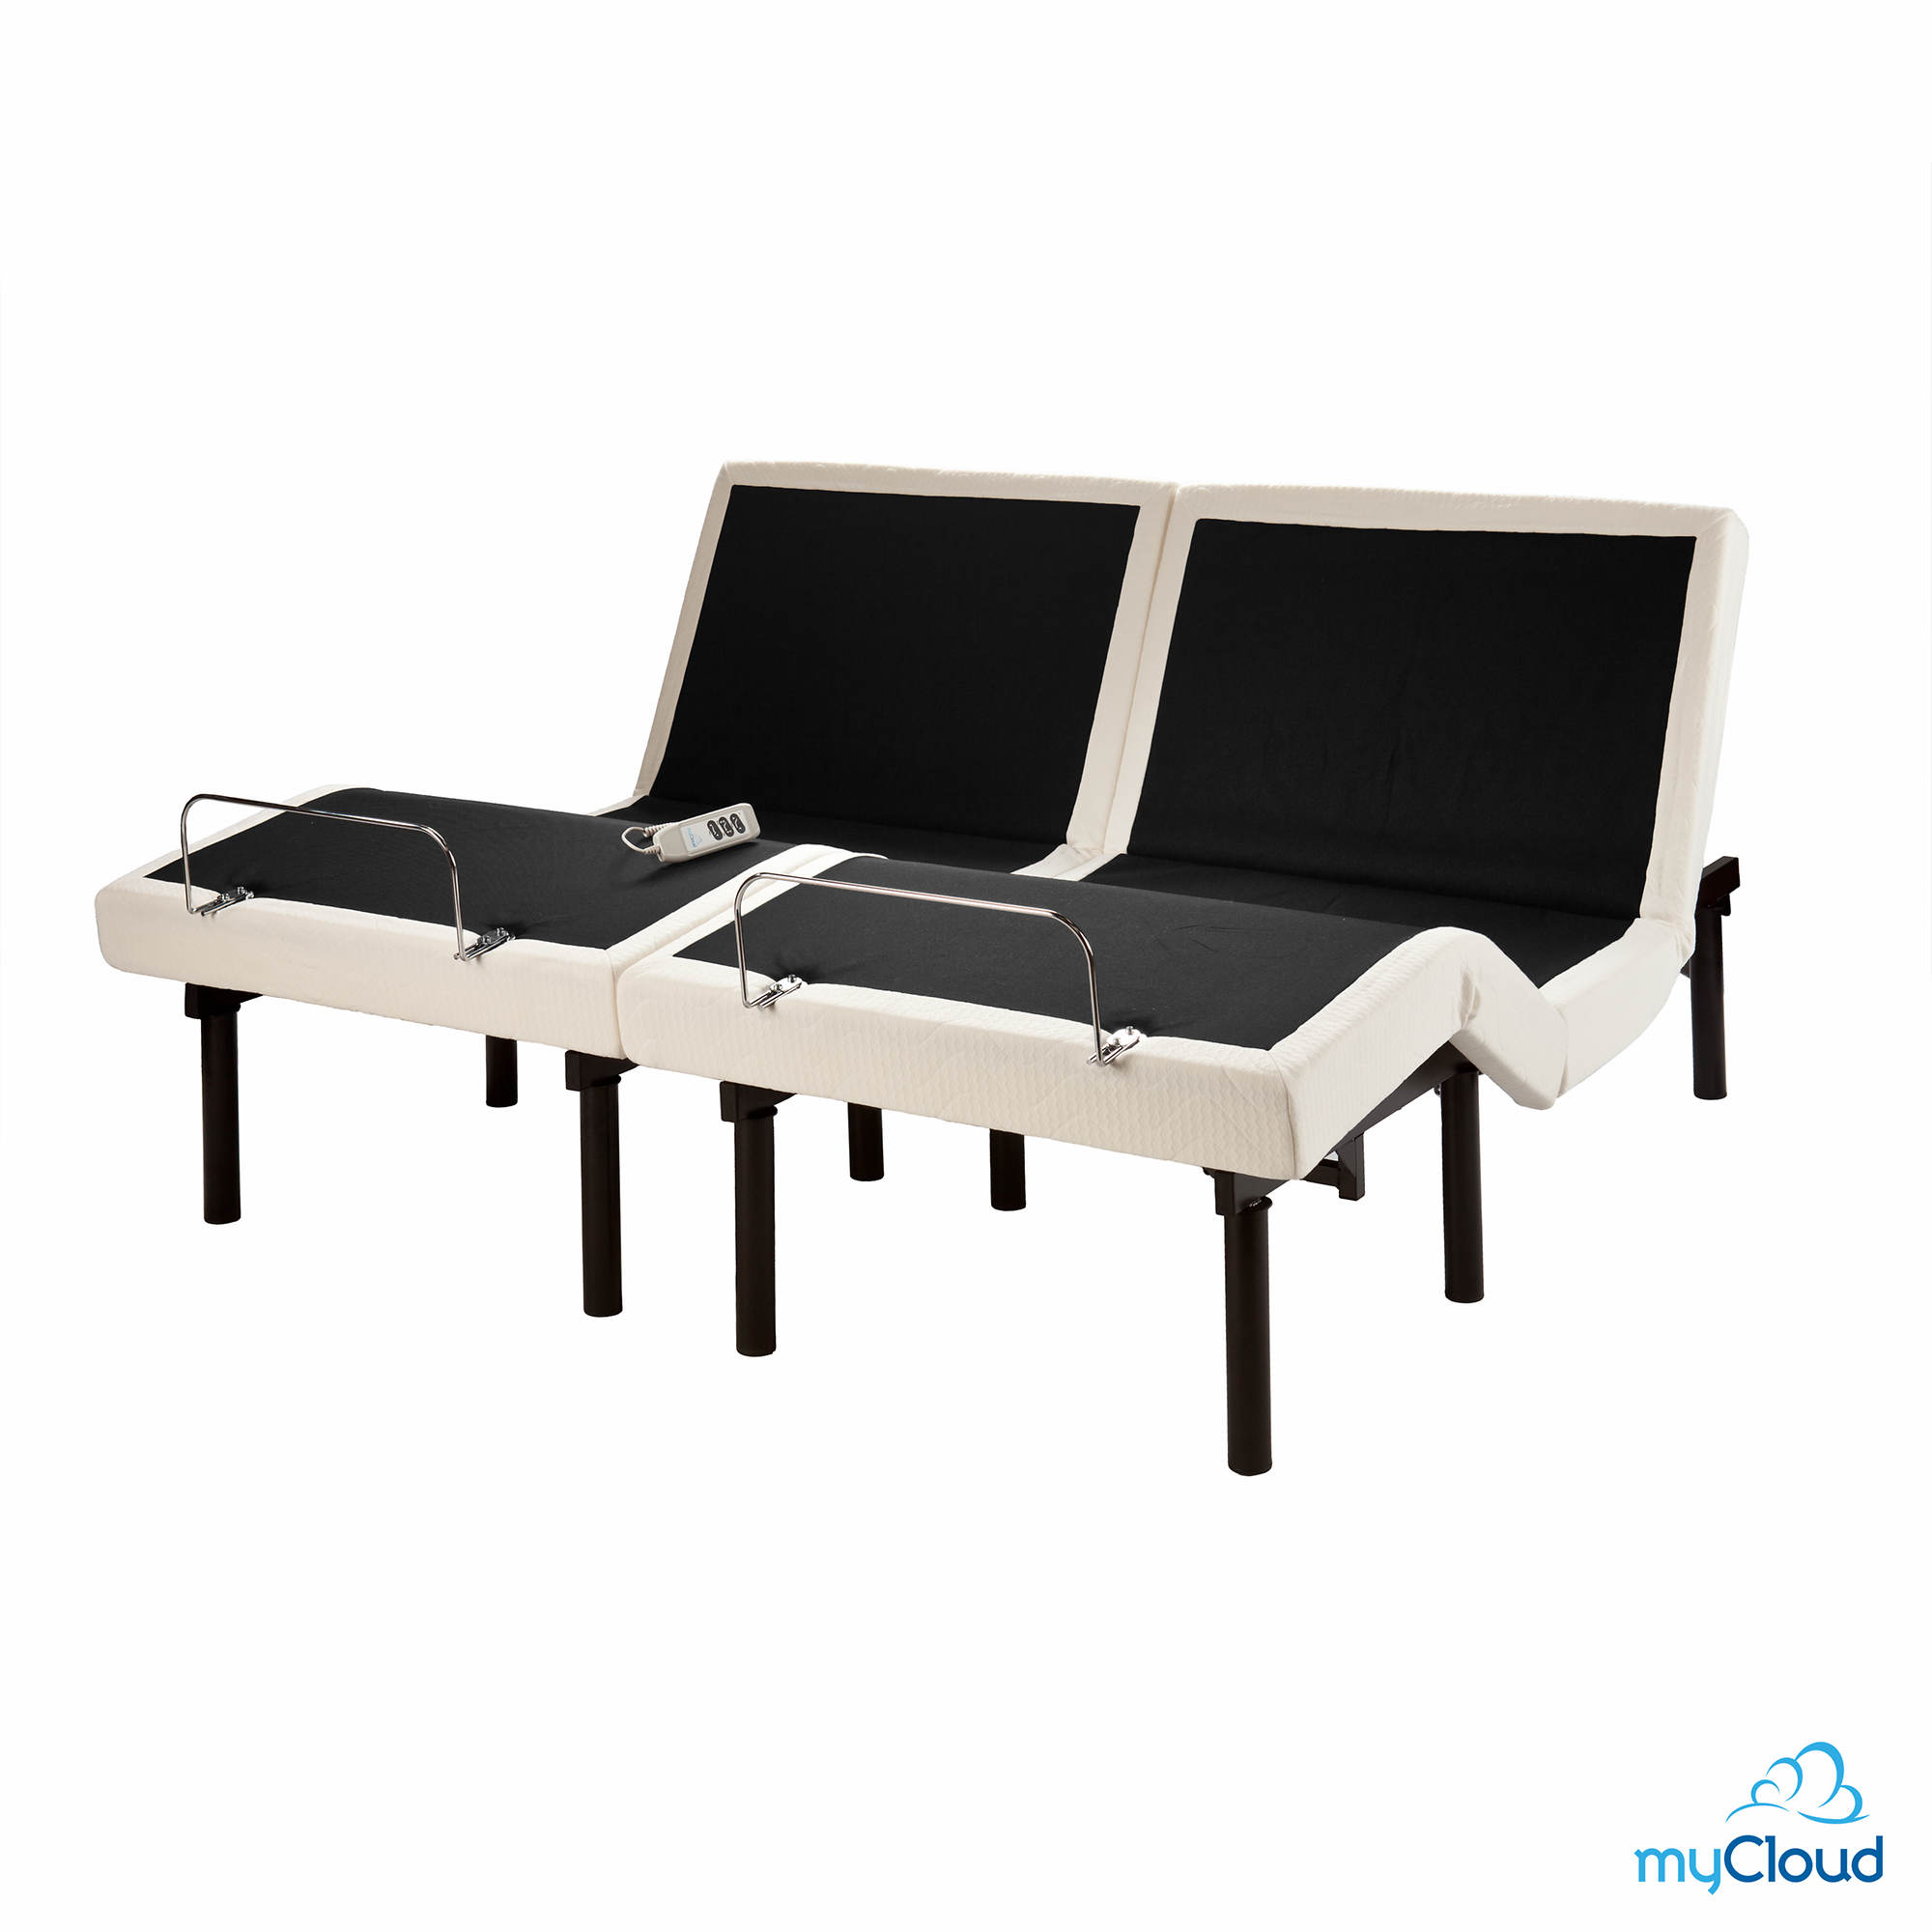 sei mycloud split california king size adjustable bed frame